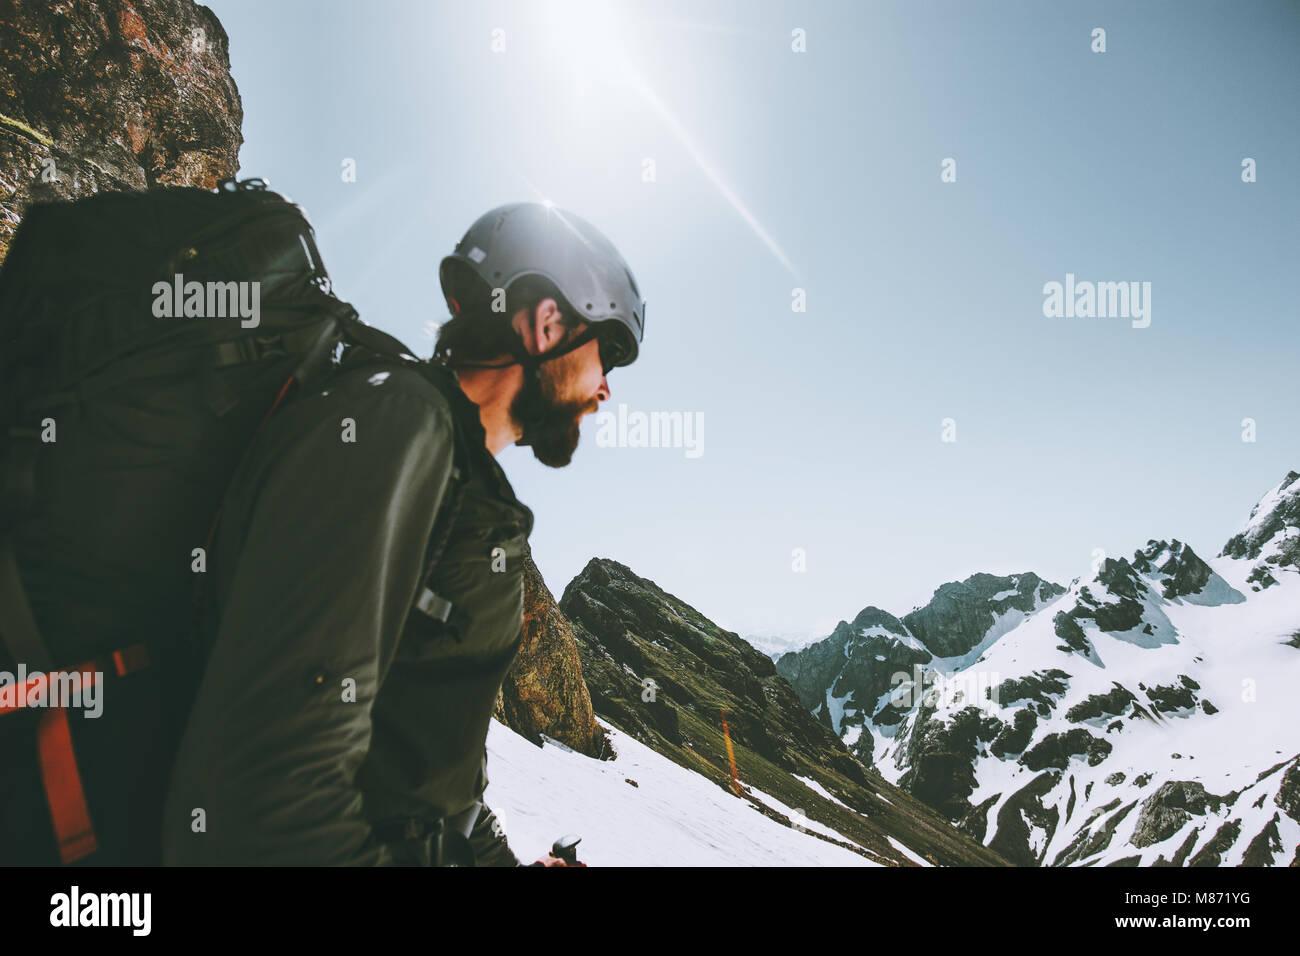 Mann Abenteurer Klettern am Berg reisen Abenteuer lifestyle Konzept outdoor Active extreme Ferien Stockbild